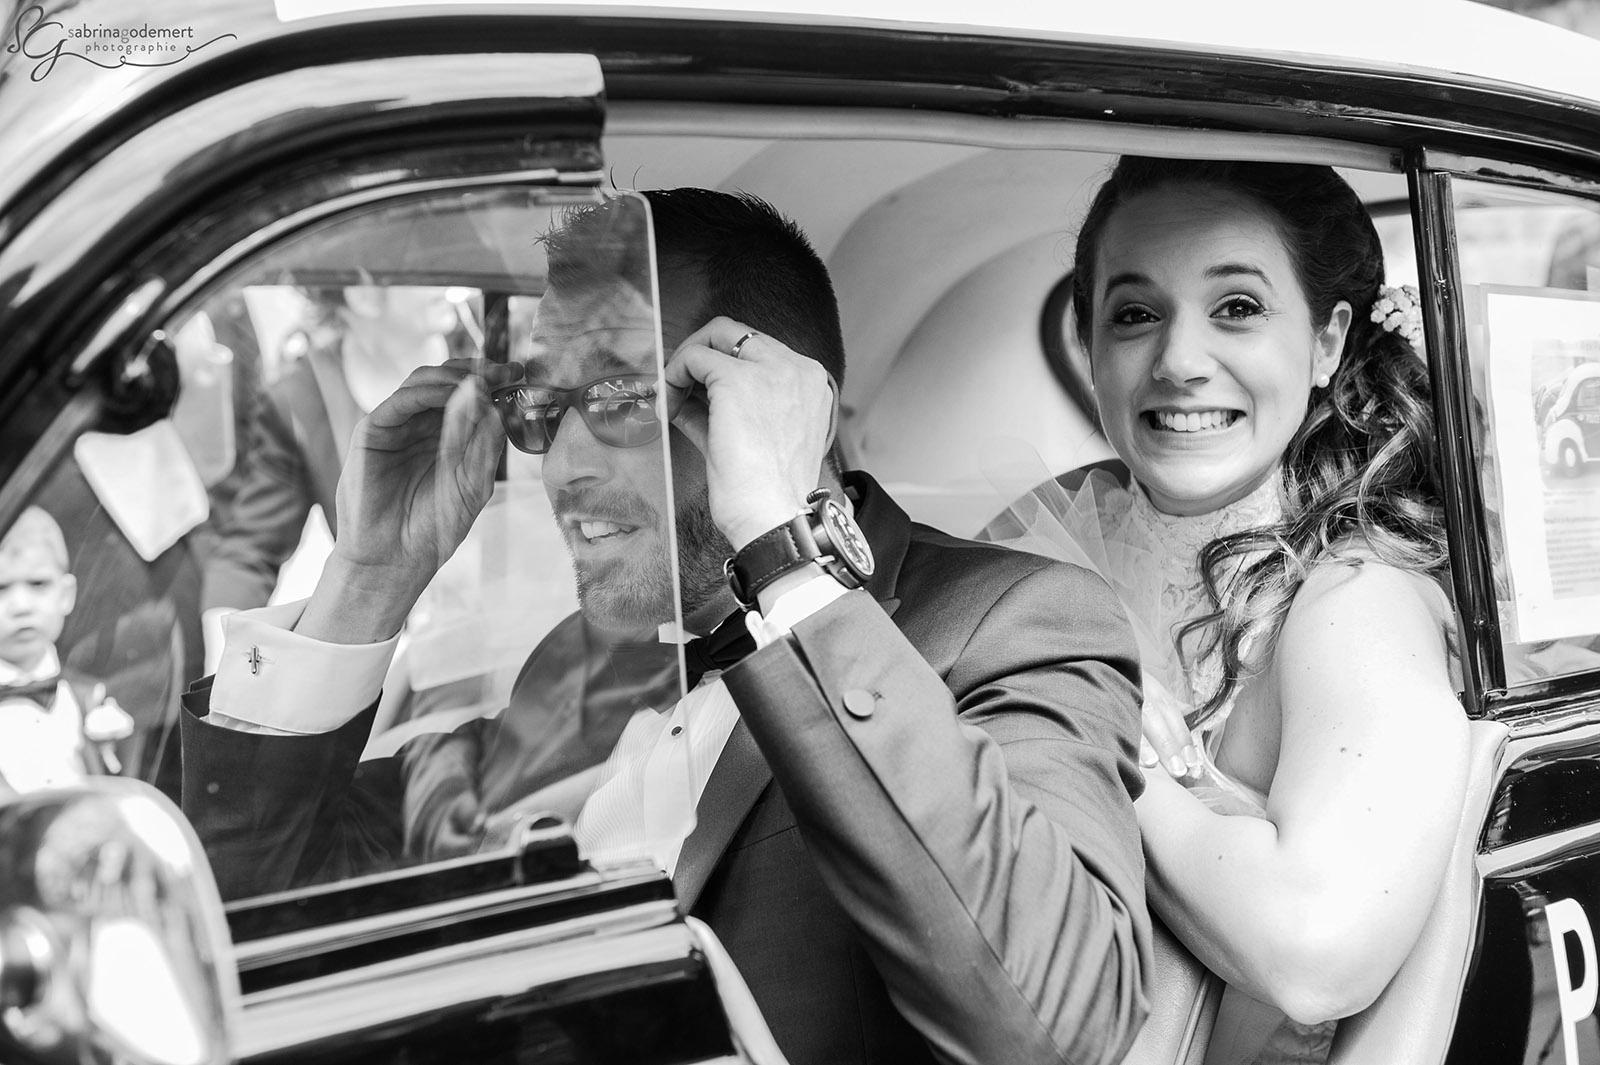 Mariage Soraya et Julien - Sabrina Godemert photographe-147